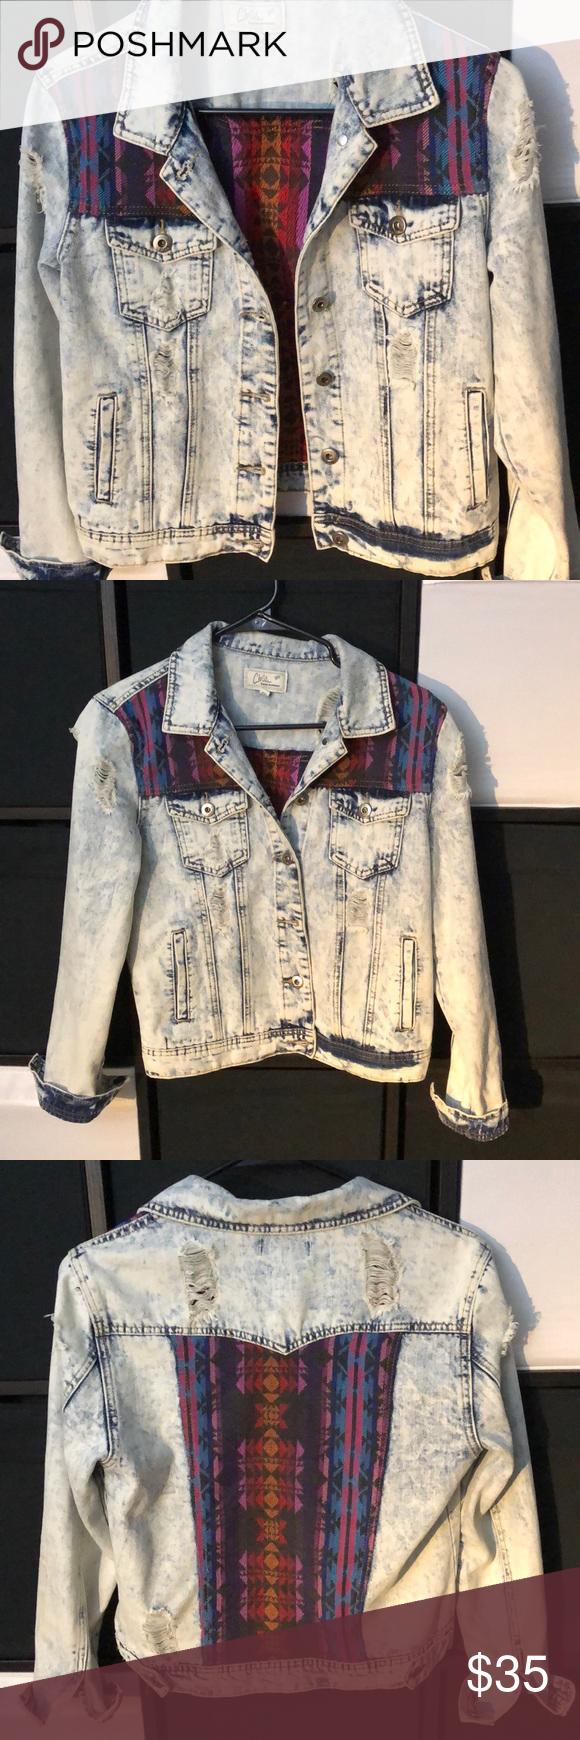 Chi Ole Denim Architect Jean Jacket Chi Ole Distressed Denim Jacket With Aztec Inspired Overlay 100 Cotton Facto Jackets Distressed Denim Jacket Jean Jacket [ 1740 x 580 Pixel ]